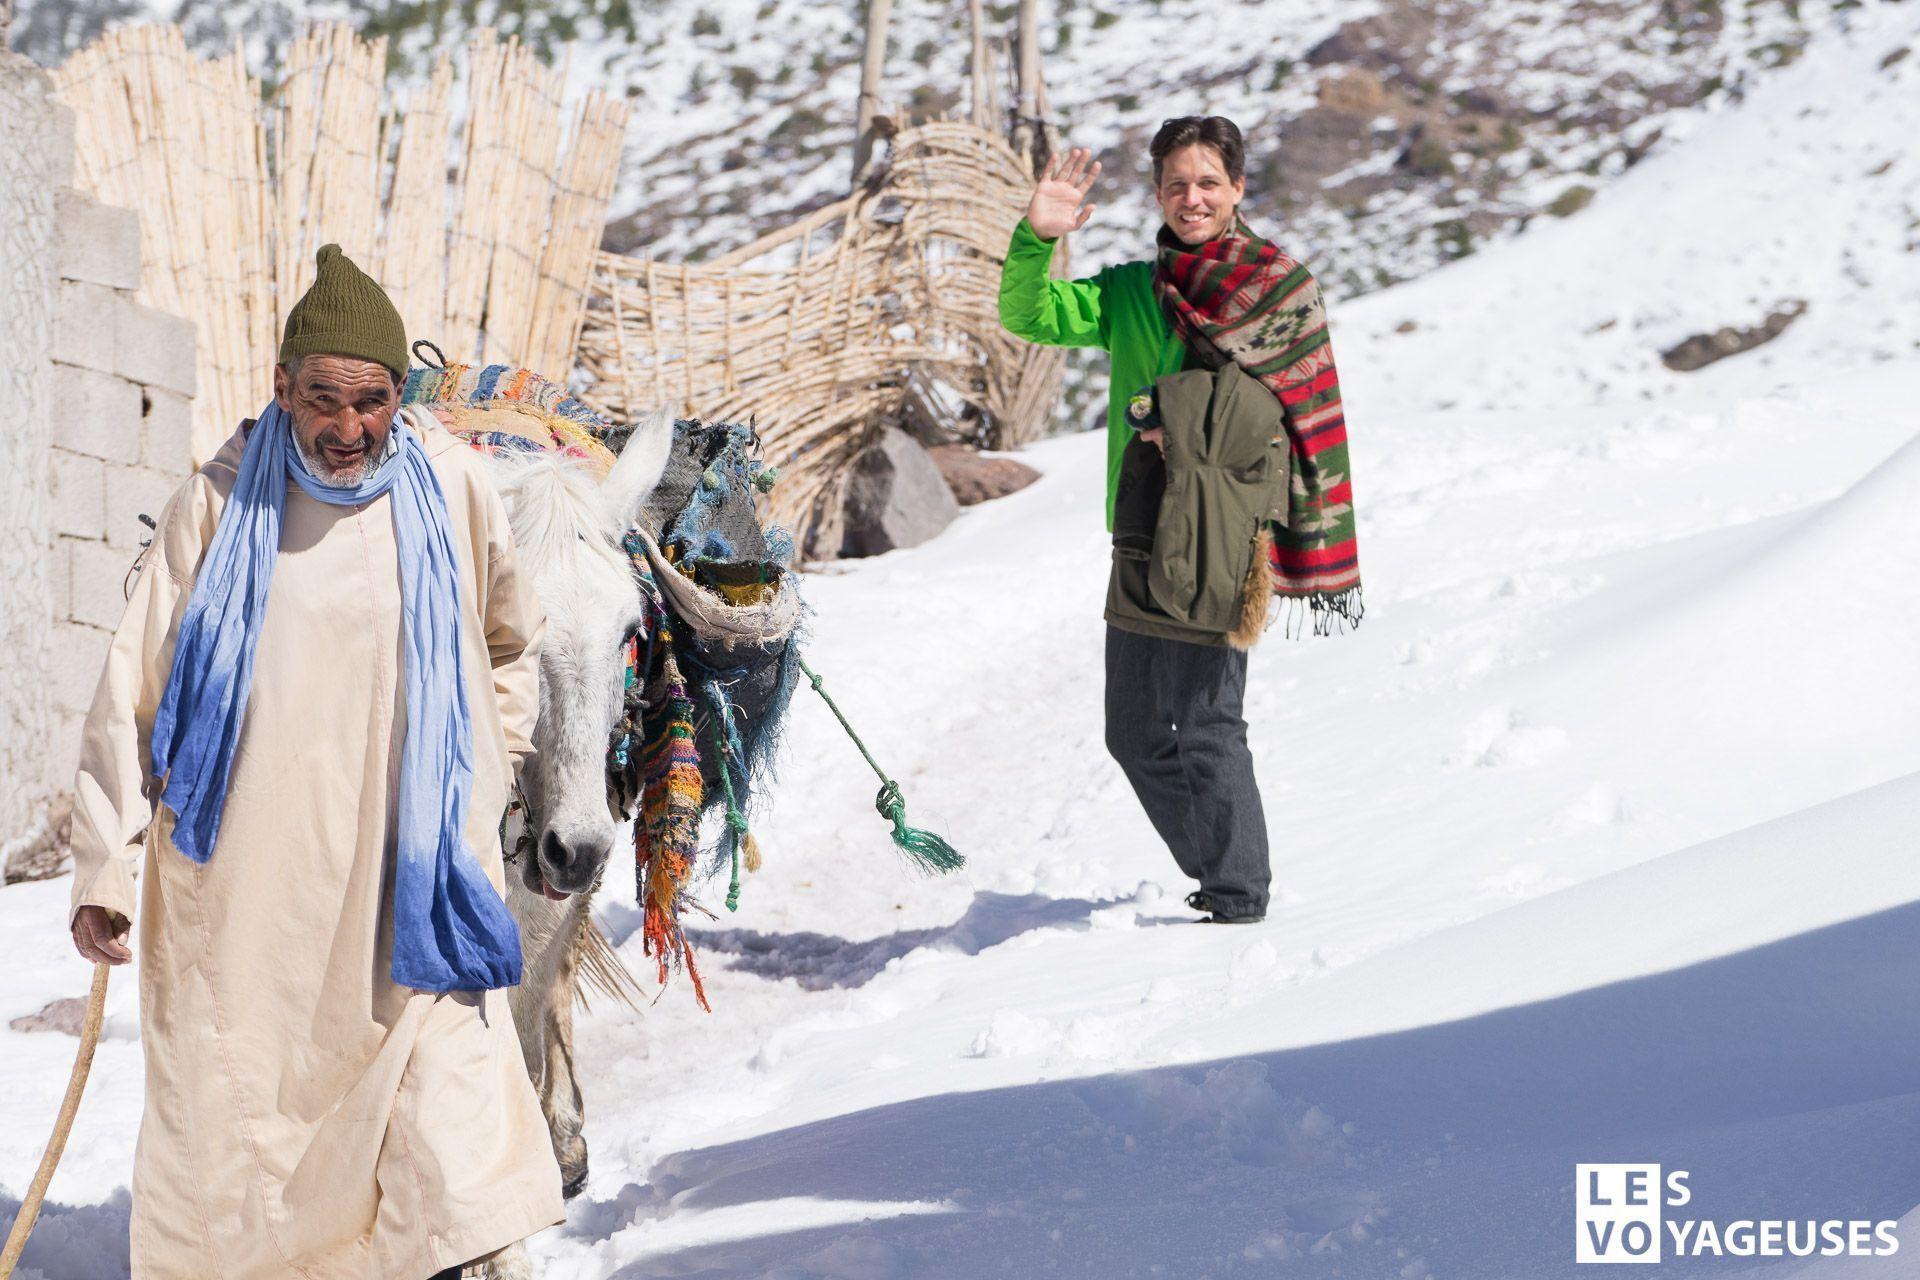 Les-voyageuses-maroc-imlil-hiver-09979